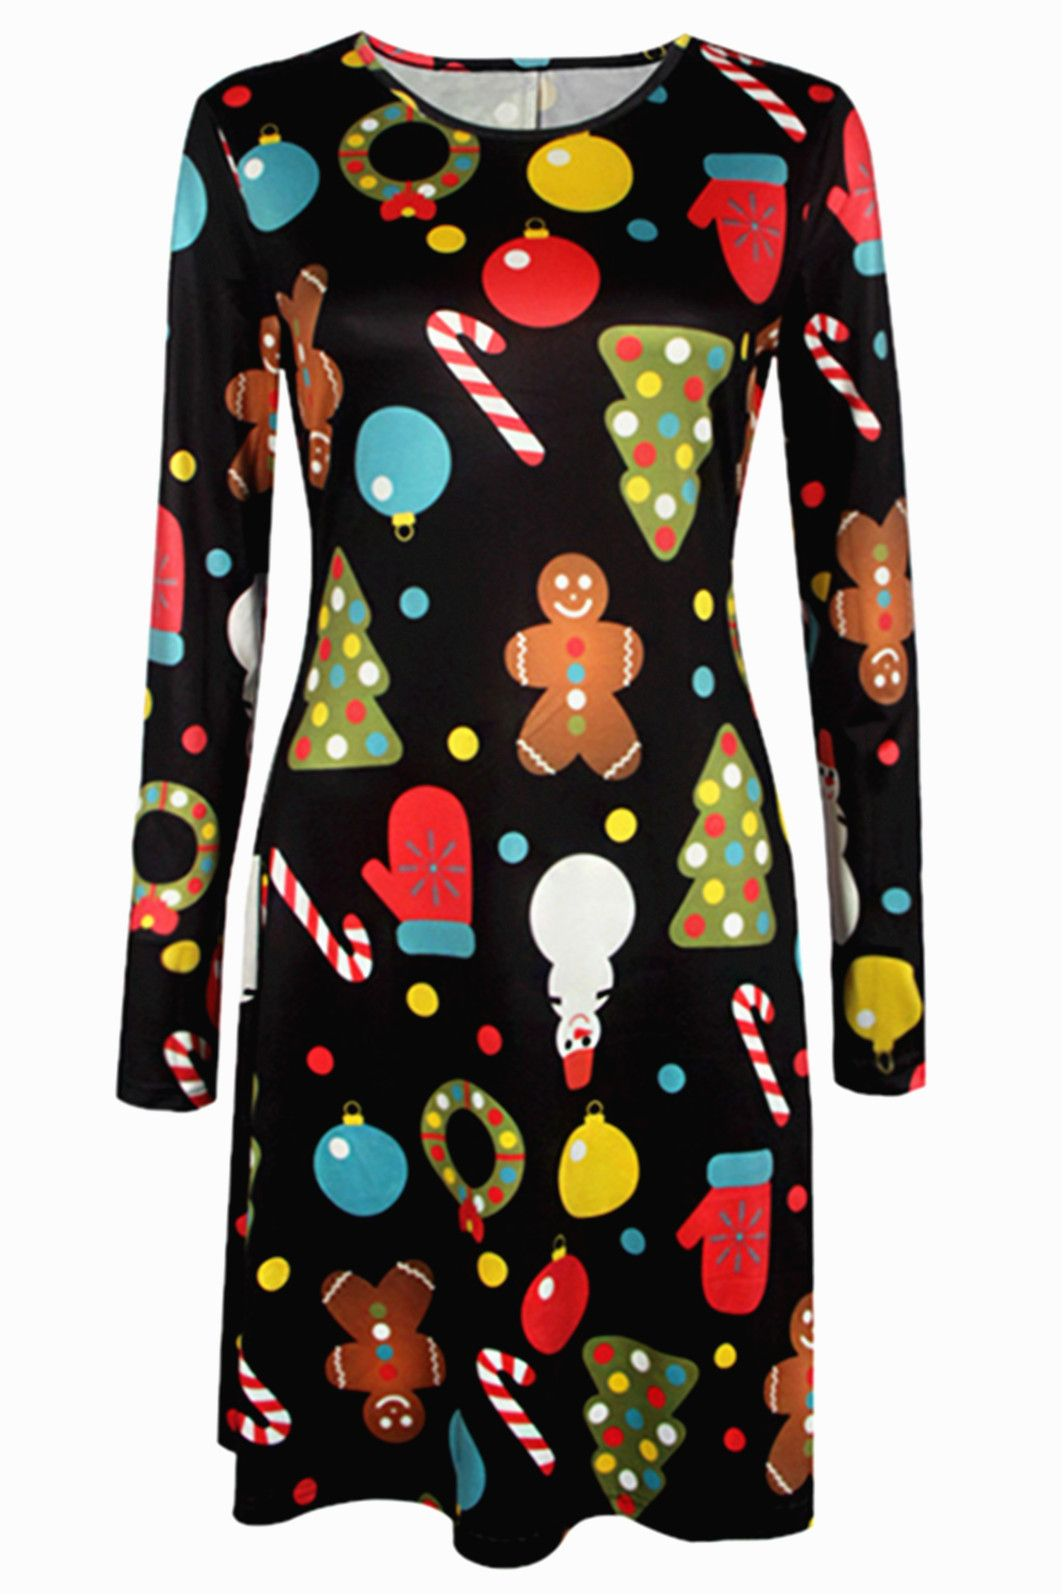 91e9ce0180b8a  12.67 Knee Length Christmas Patterned Dress. 2019 Autumn Winter Christmas  Dress Women Plus Size Print Dress Midi Elkrricdress Christmas Print Dresses